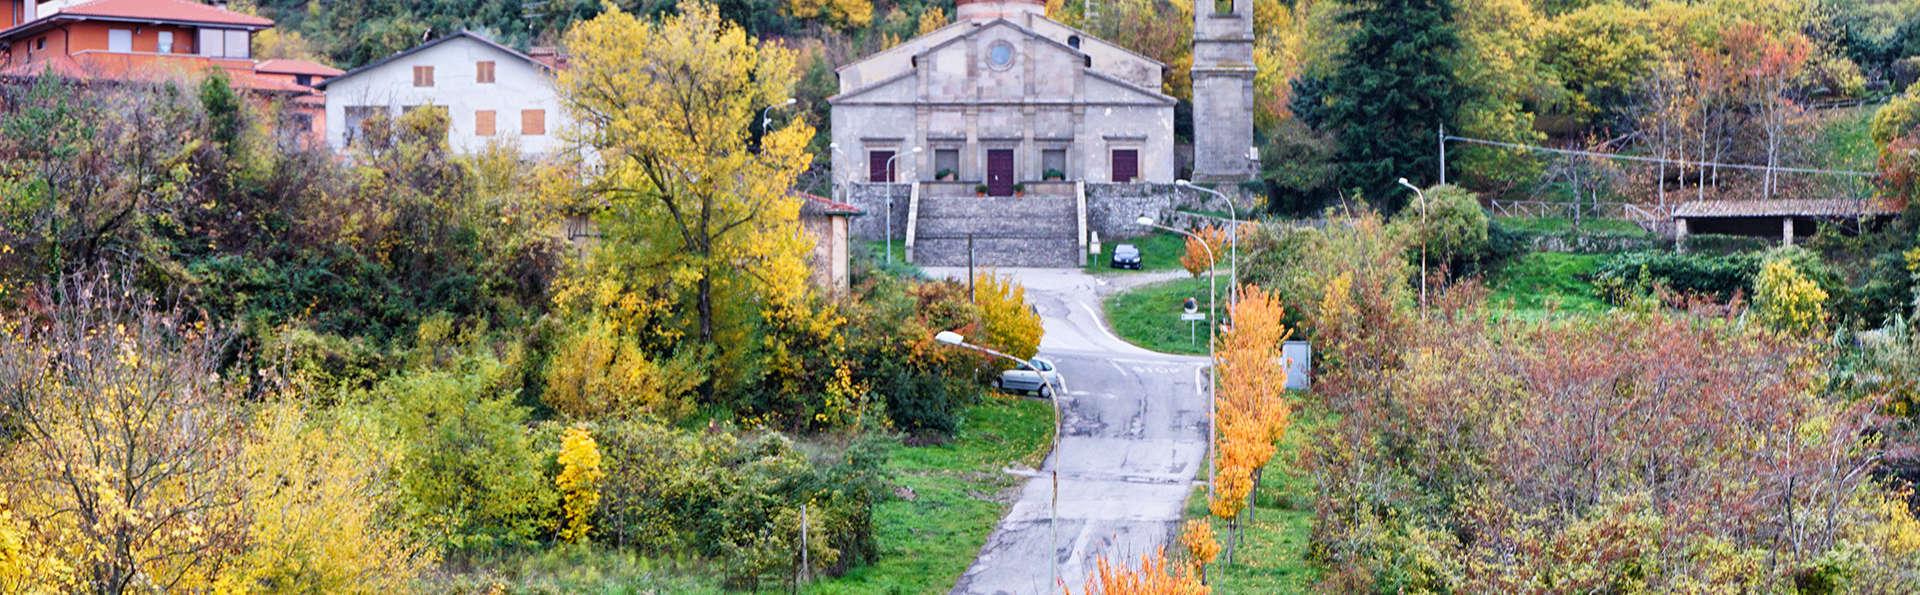 Agriturismo Bio I Rondinelli - EDIT_NEW_Front.jpg